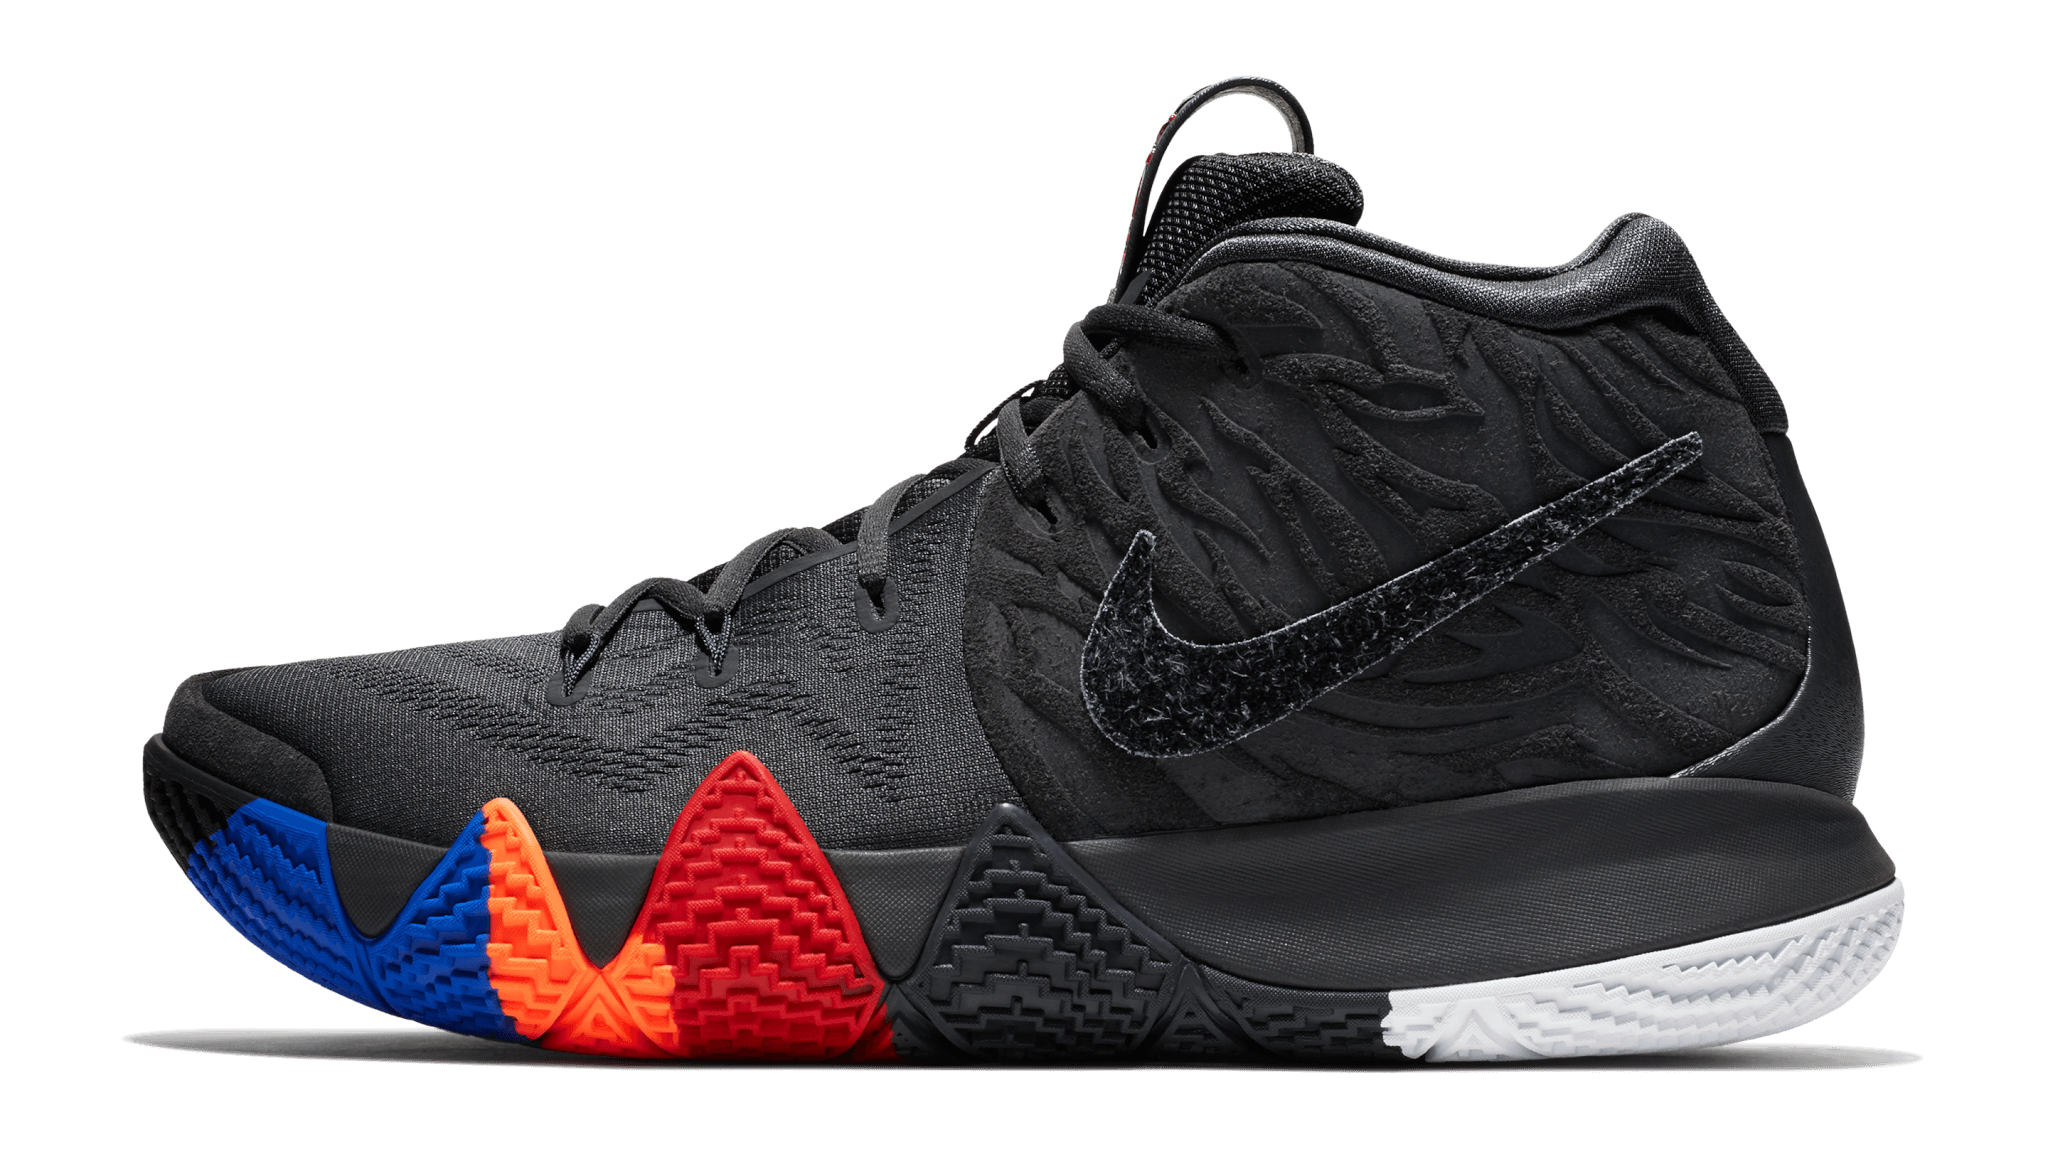 e222894075f18 Nike Kyrie 4 Performance Review